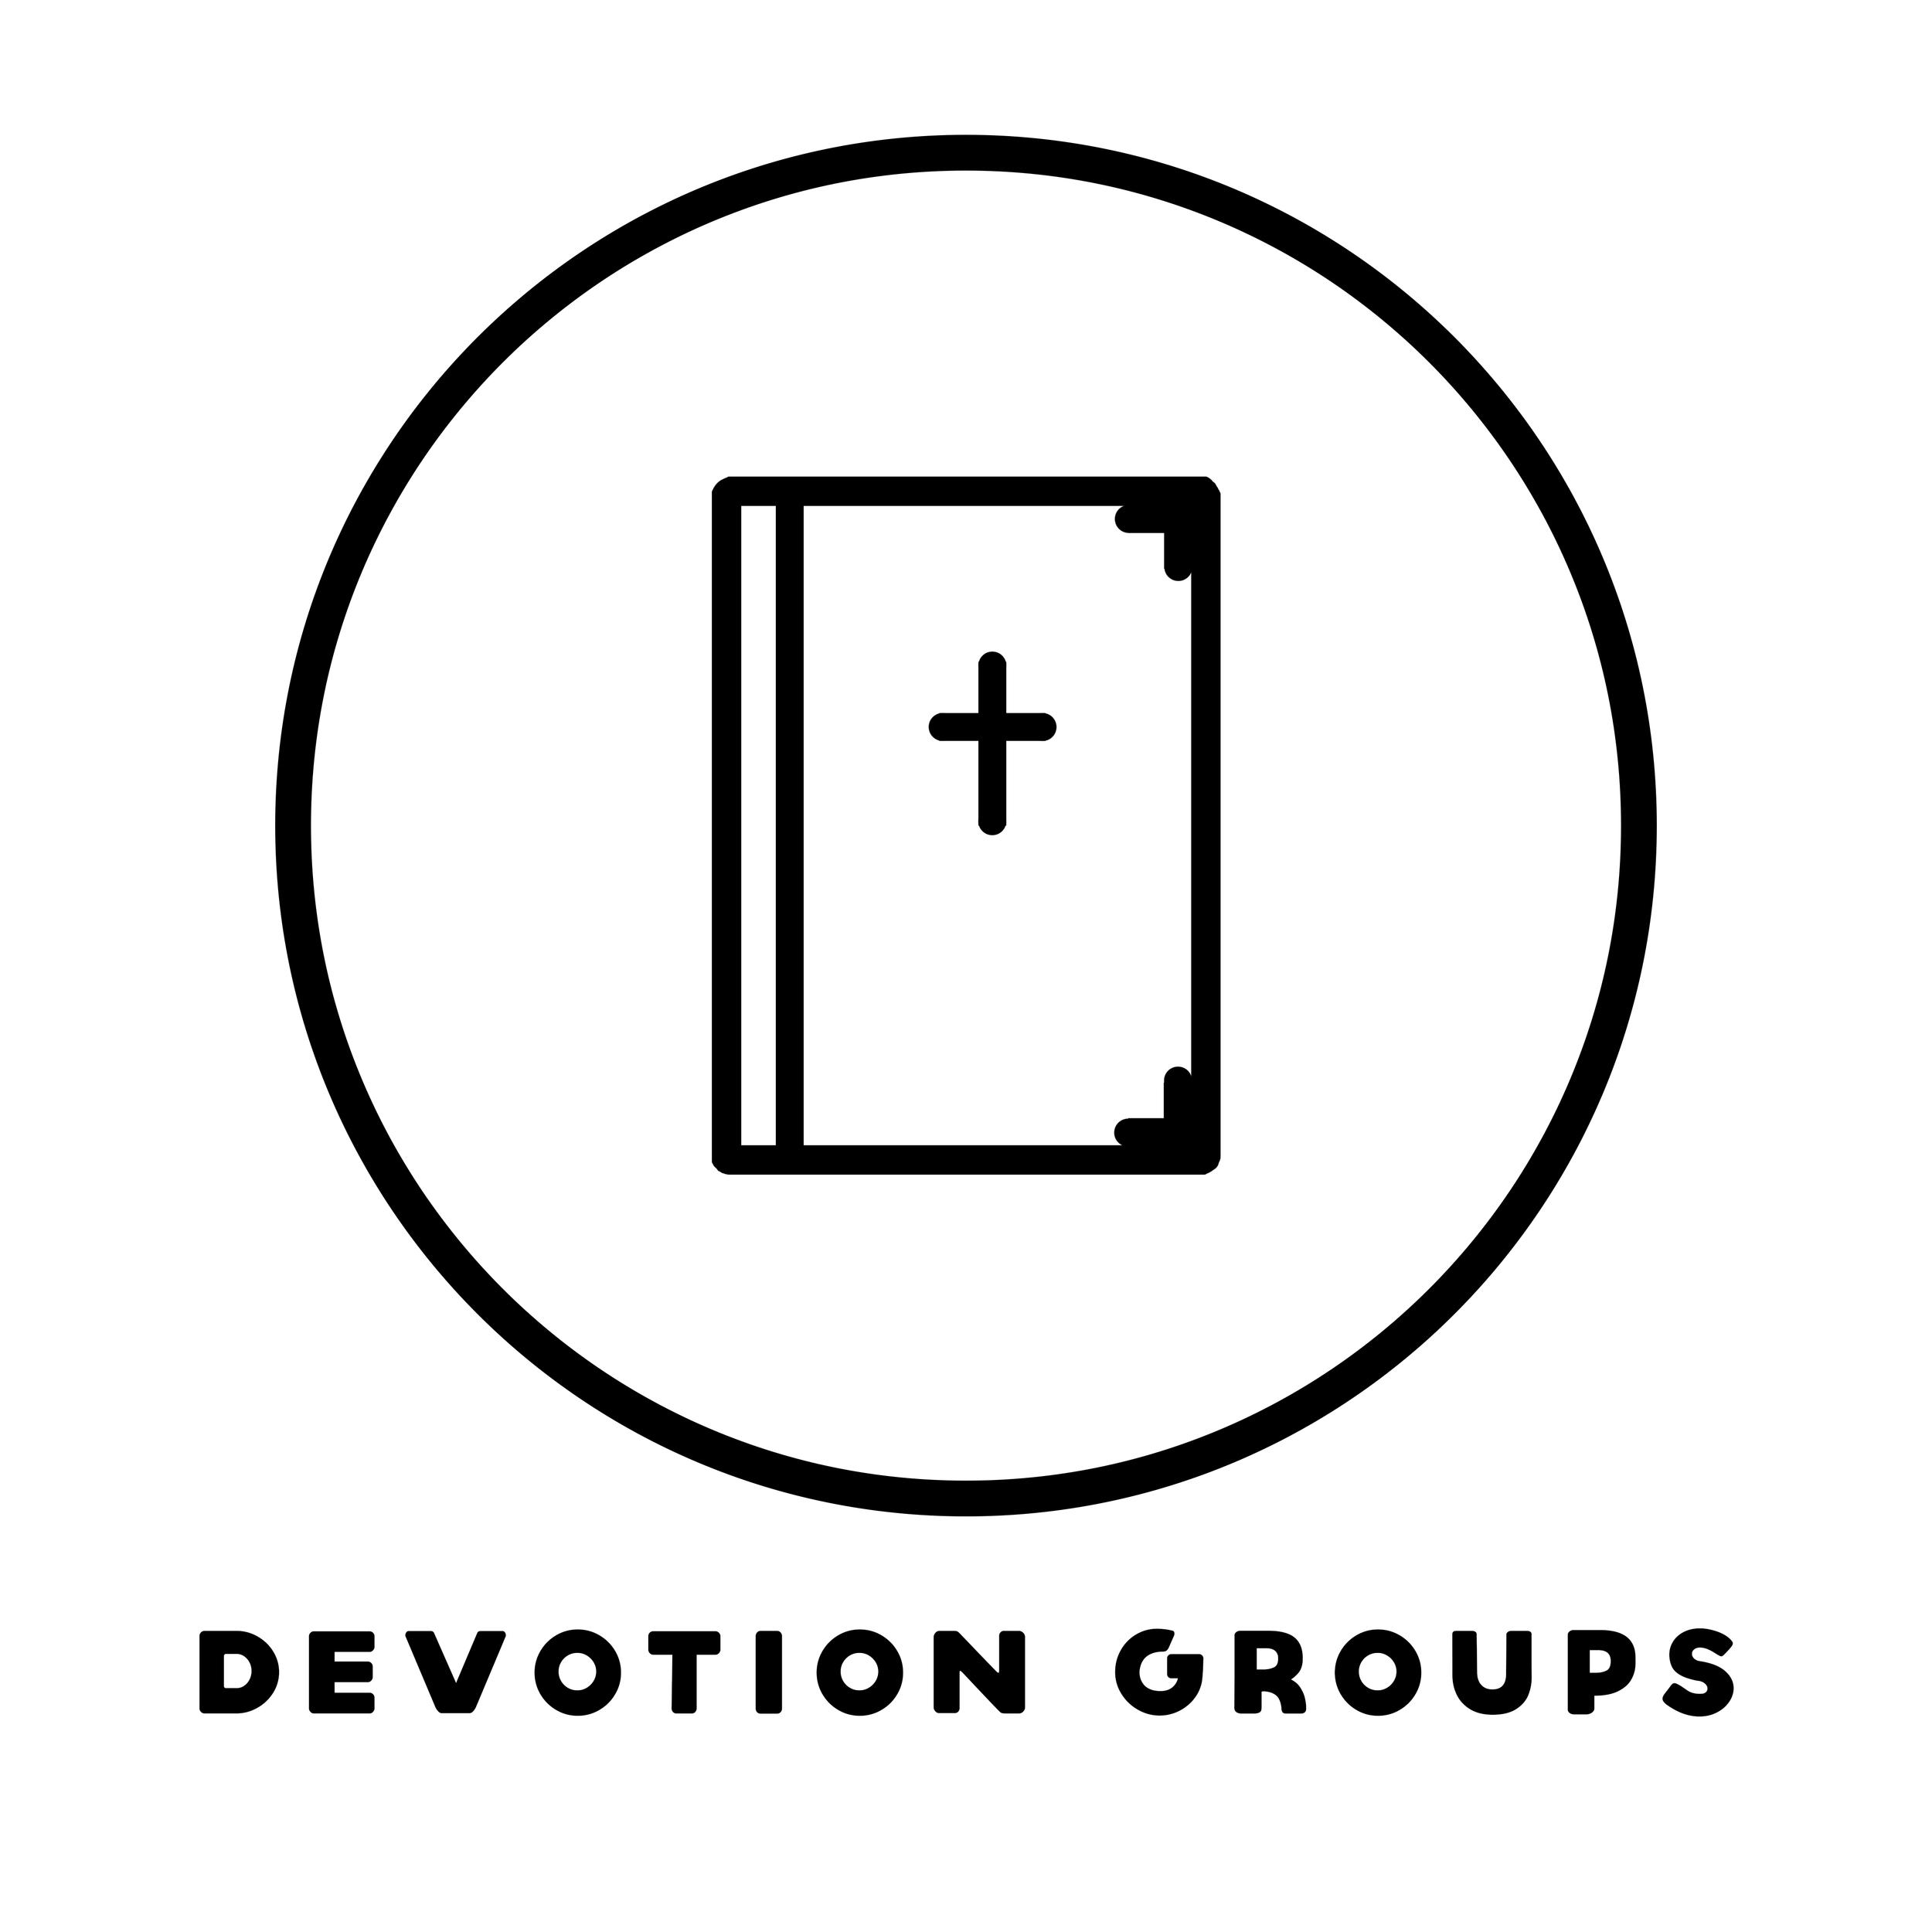 Logo_DevotionGroups.png